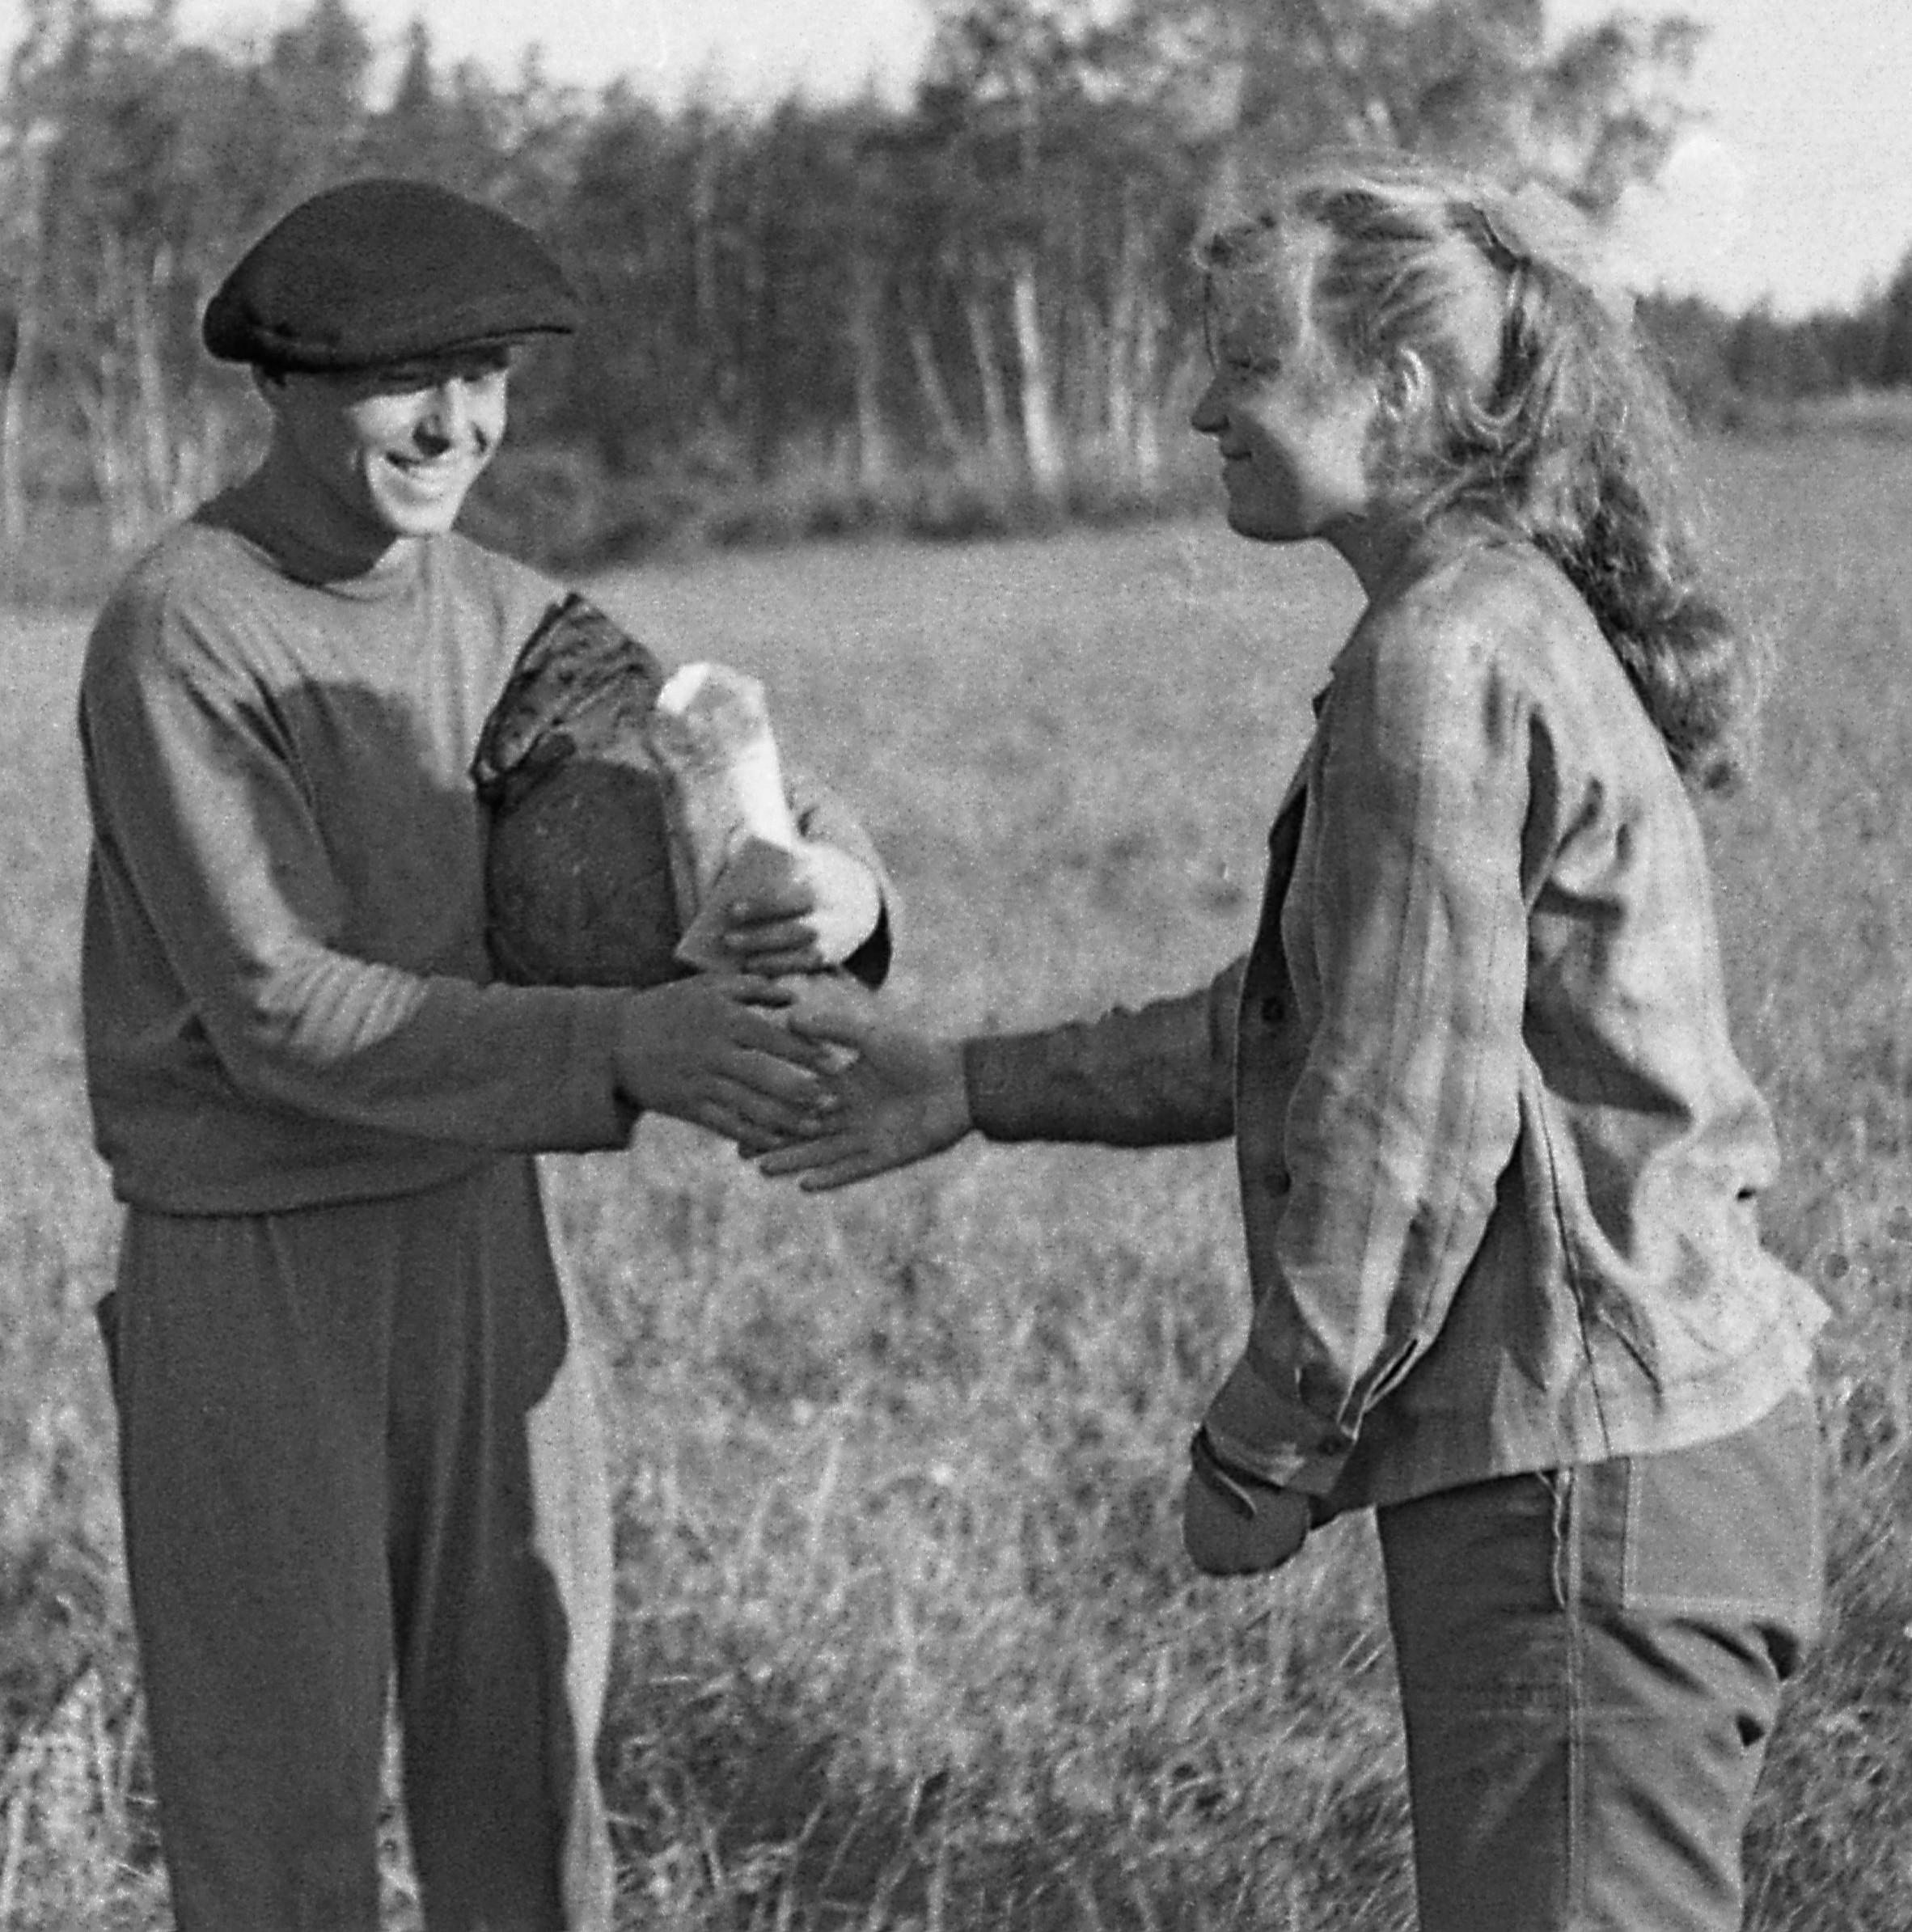 195. Футбол. Валя Кузнецова Э-67